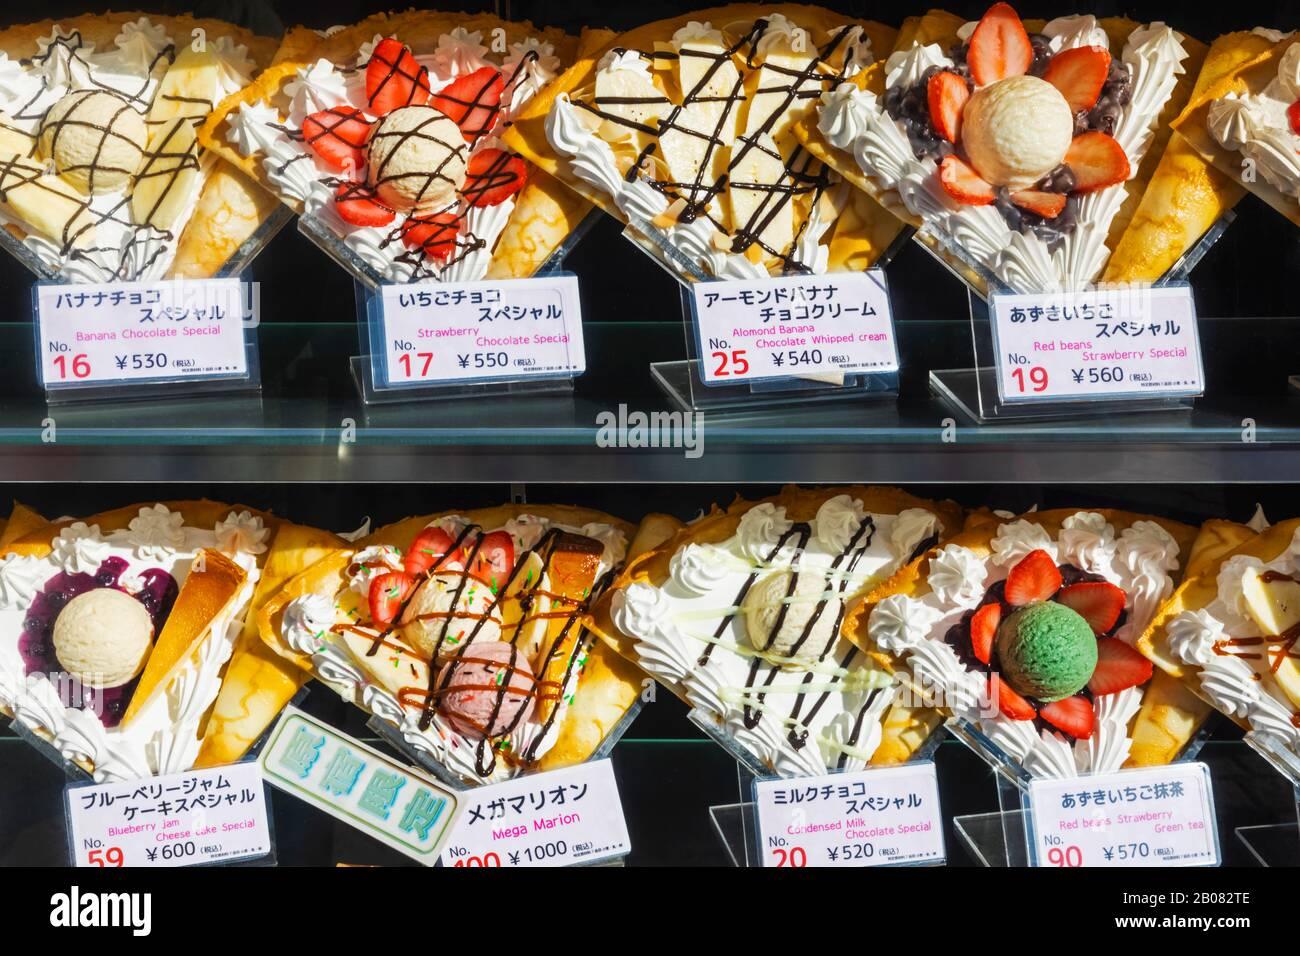 Japan Honshu Tokyo Harajuku Takeshita Dori Crepe Shop Window Display Of Plastic Crepes Stock Photo Alamy